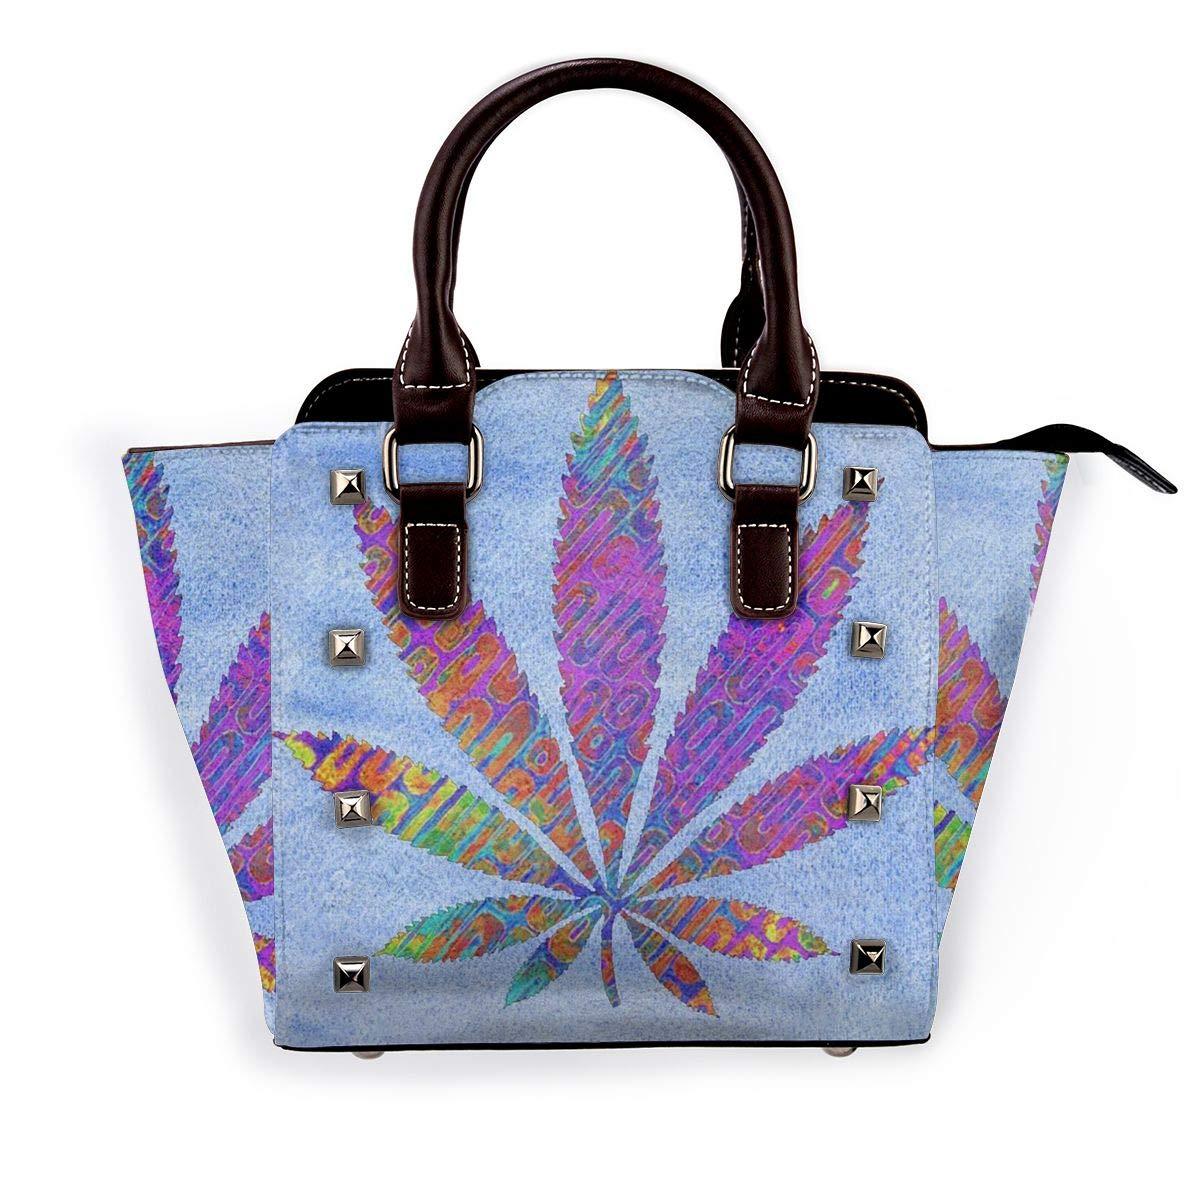 Use4 Marijuana Leaves Green Rivet PU Leather Tote Bag Shoulder Bag Purse